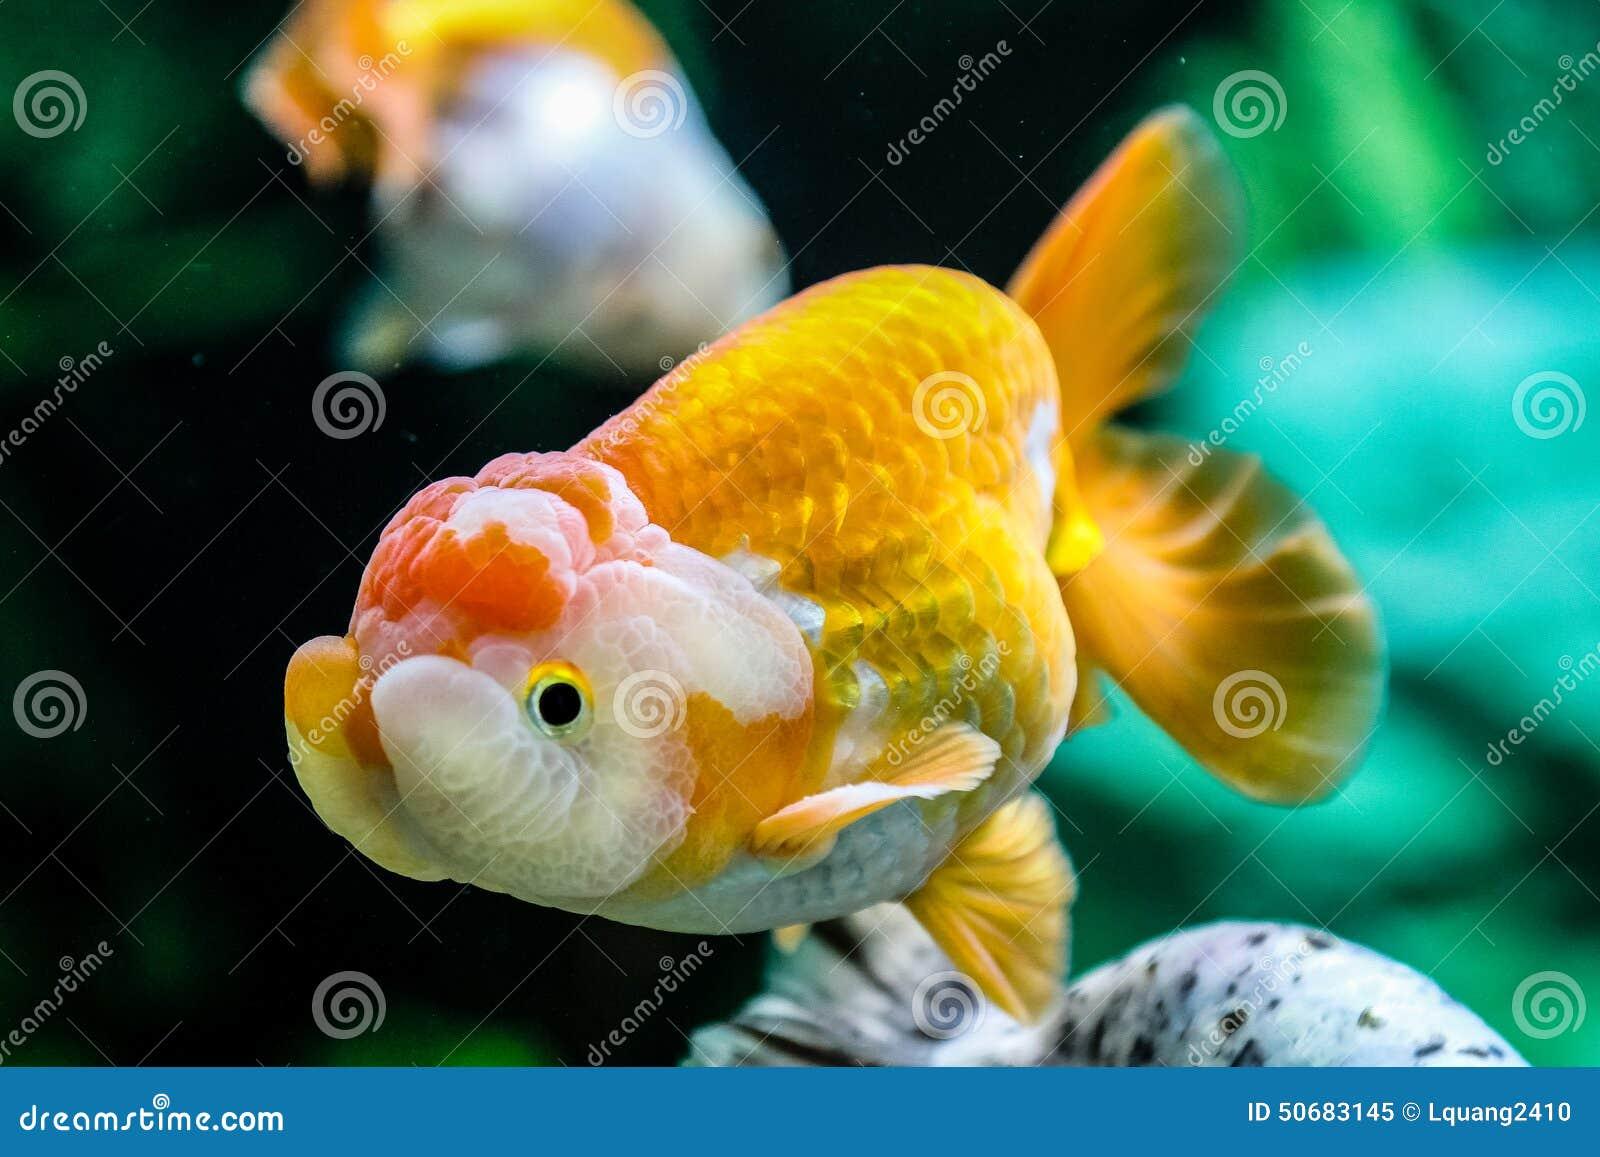 Download 关闭在水族馆的金鱼 库存图片. 图片 包括有 行动, 金鱼, 本质, beauvoir, 孤独, 金子, 水生 - 50683145